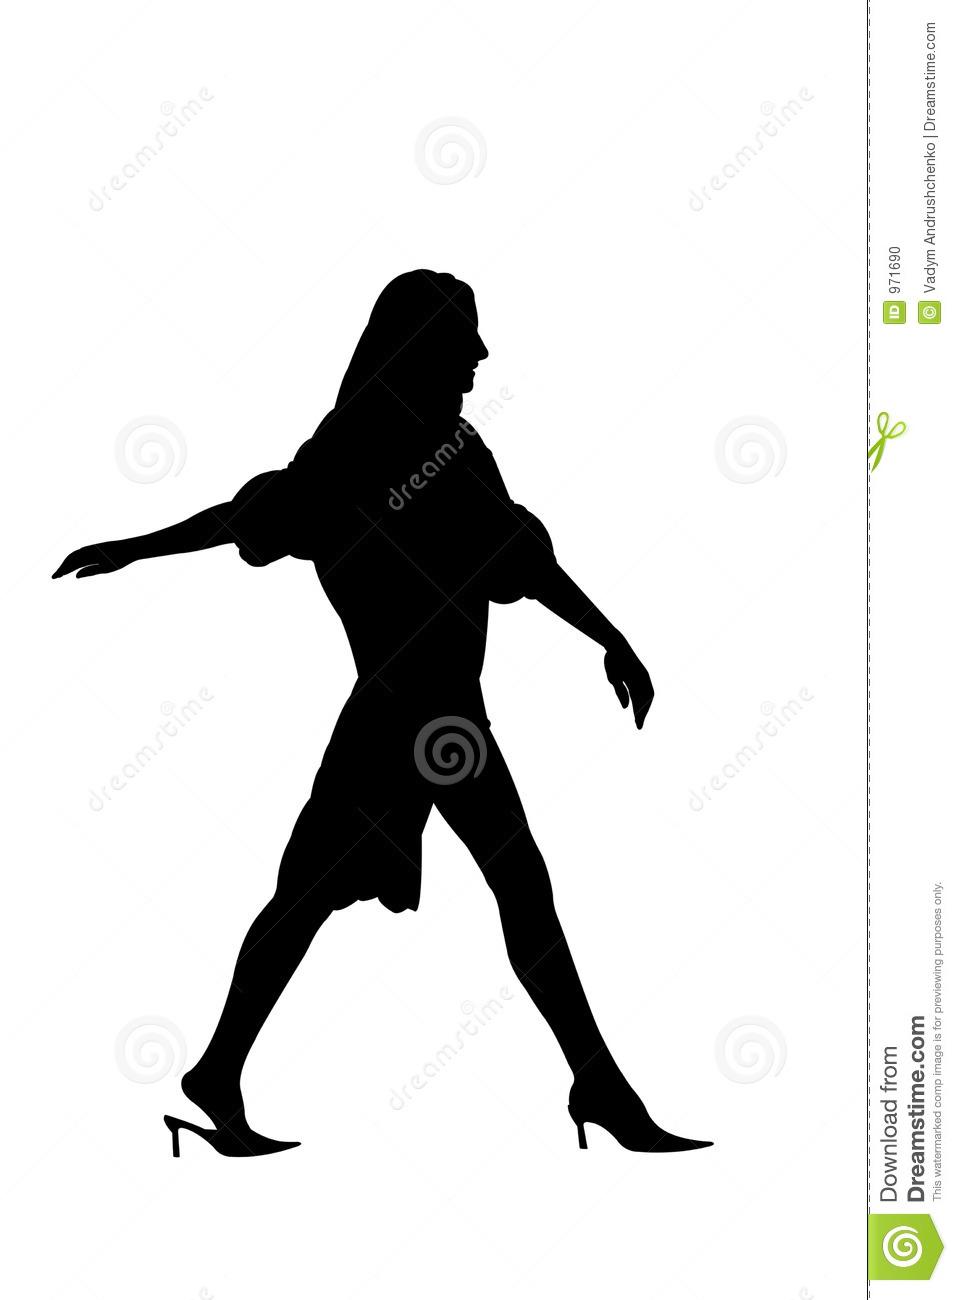 Silhouette Of A Woman Walking Away.